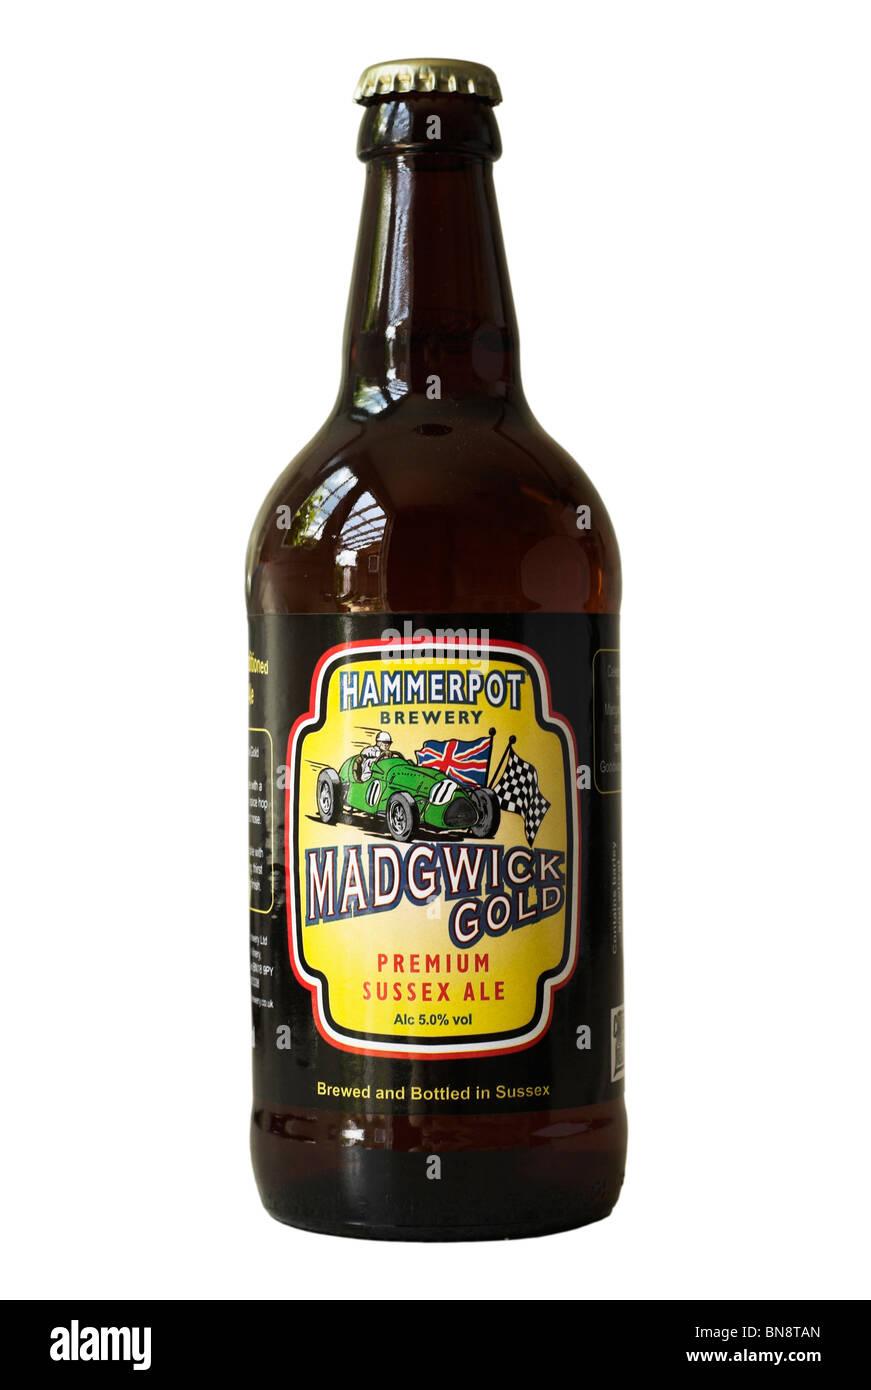 Hammerpot Brauerei Madgwick Gold Premium Sussex Ale Flaschenbier - Juni 2010. Stockbild